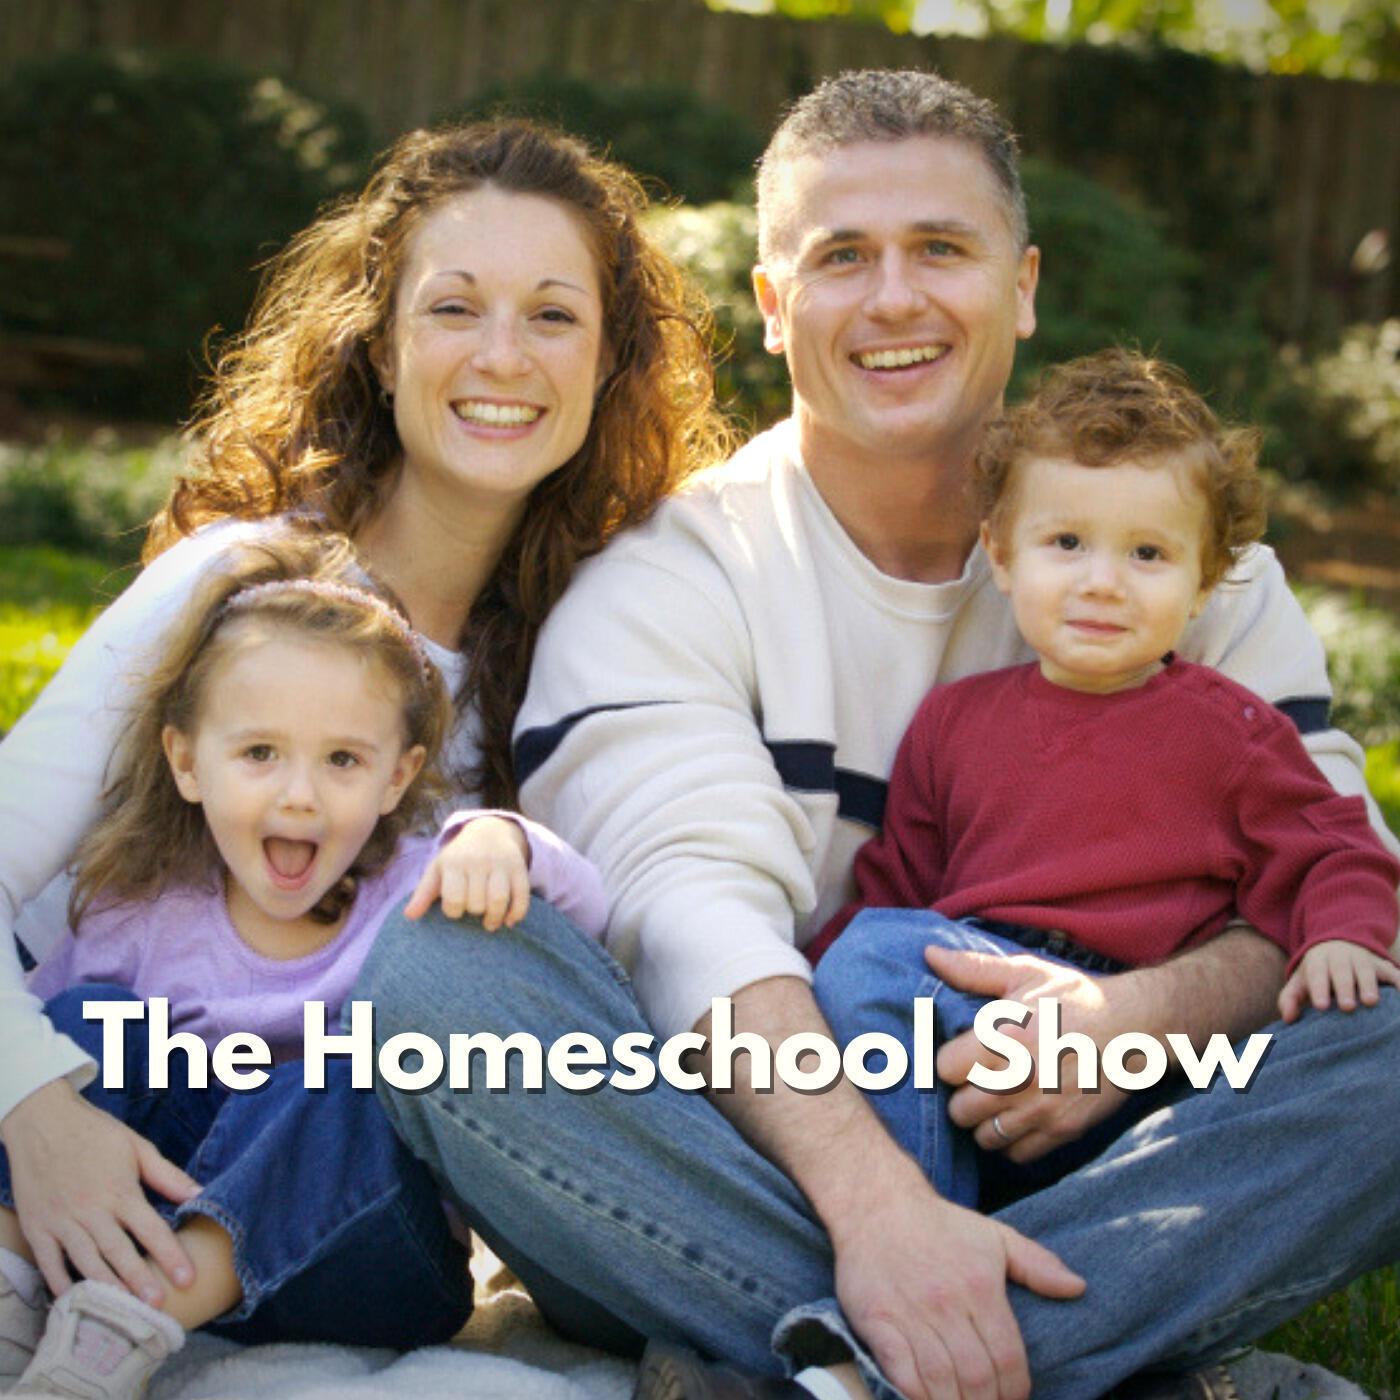 The Homeschool Show